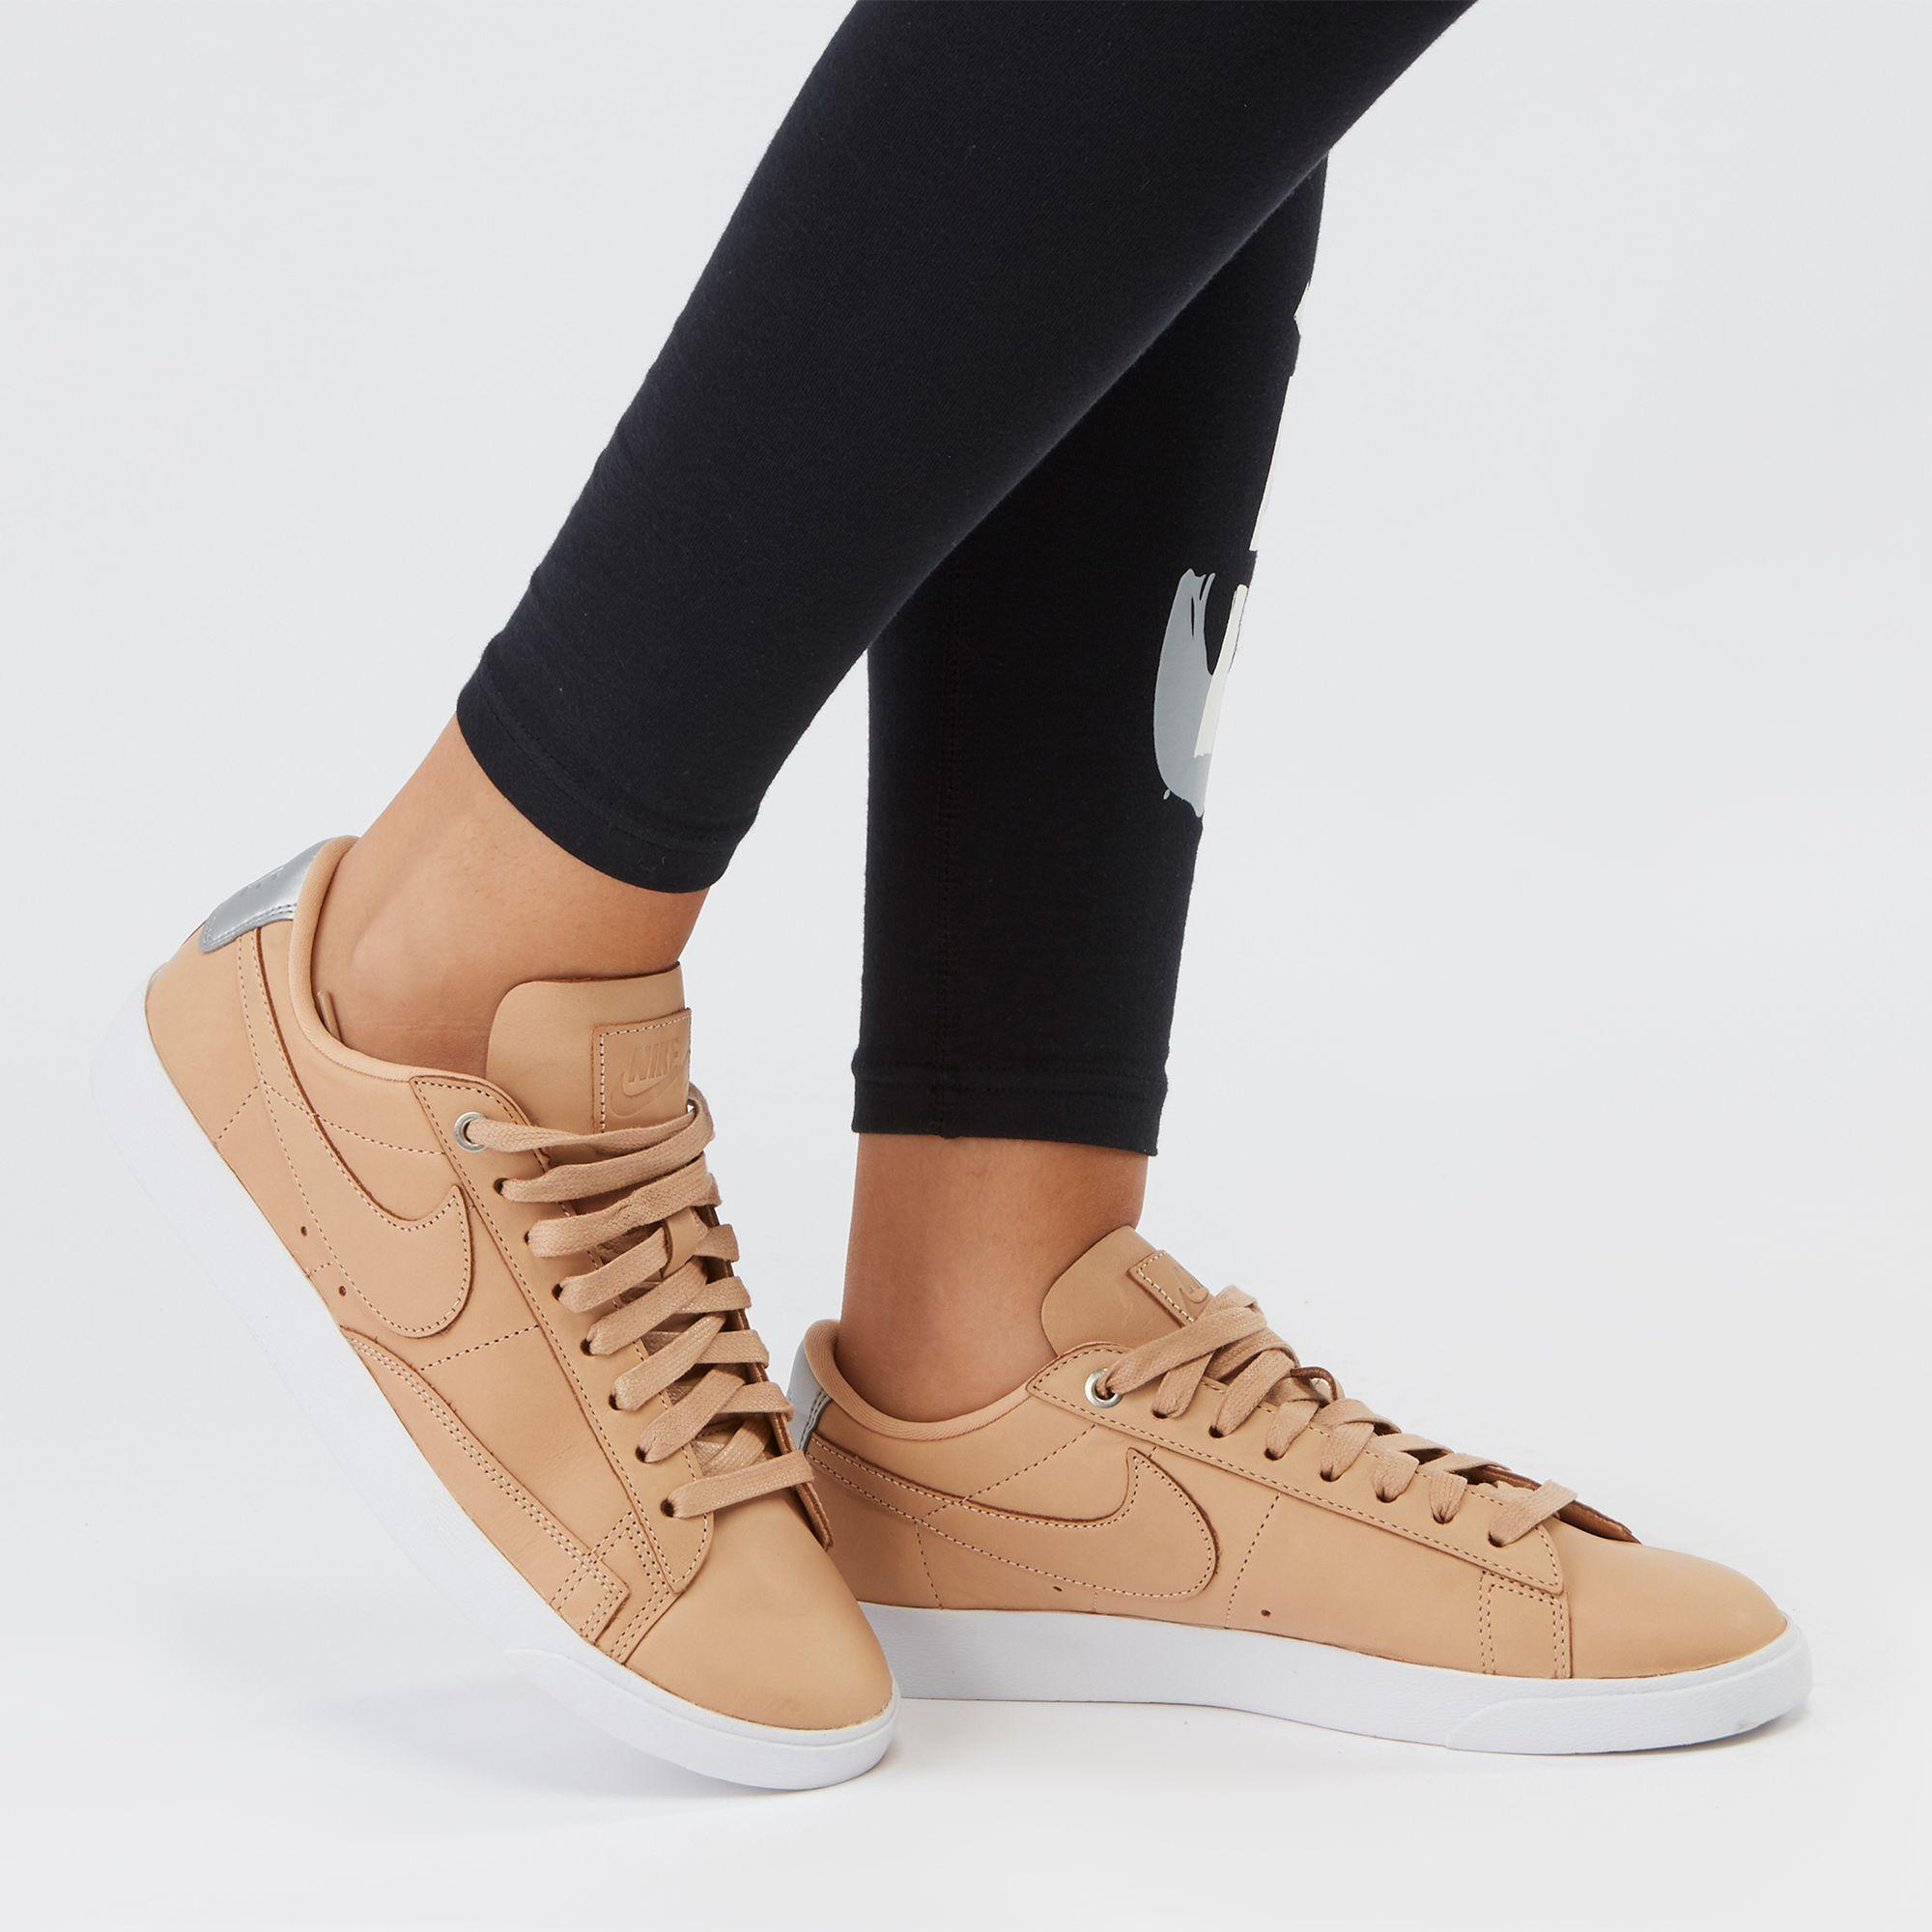 brand new 09334 837d5 Nike Blazer Premium Low QS Shoe | Sneakers | Shoes | Women's Sale ...